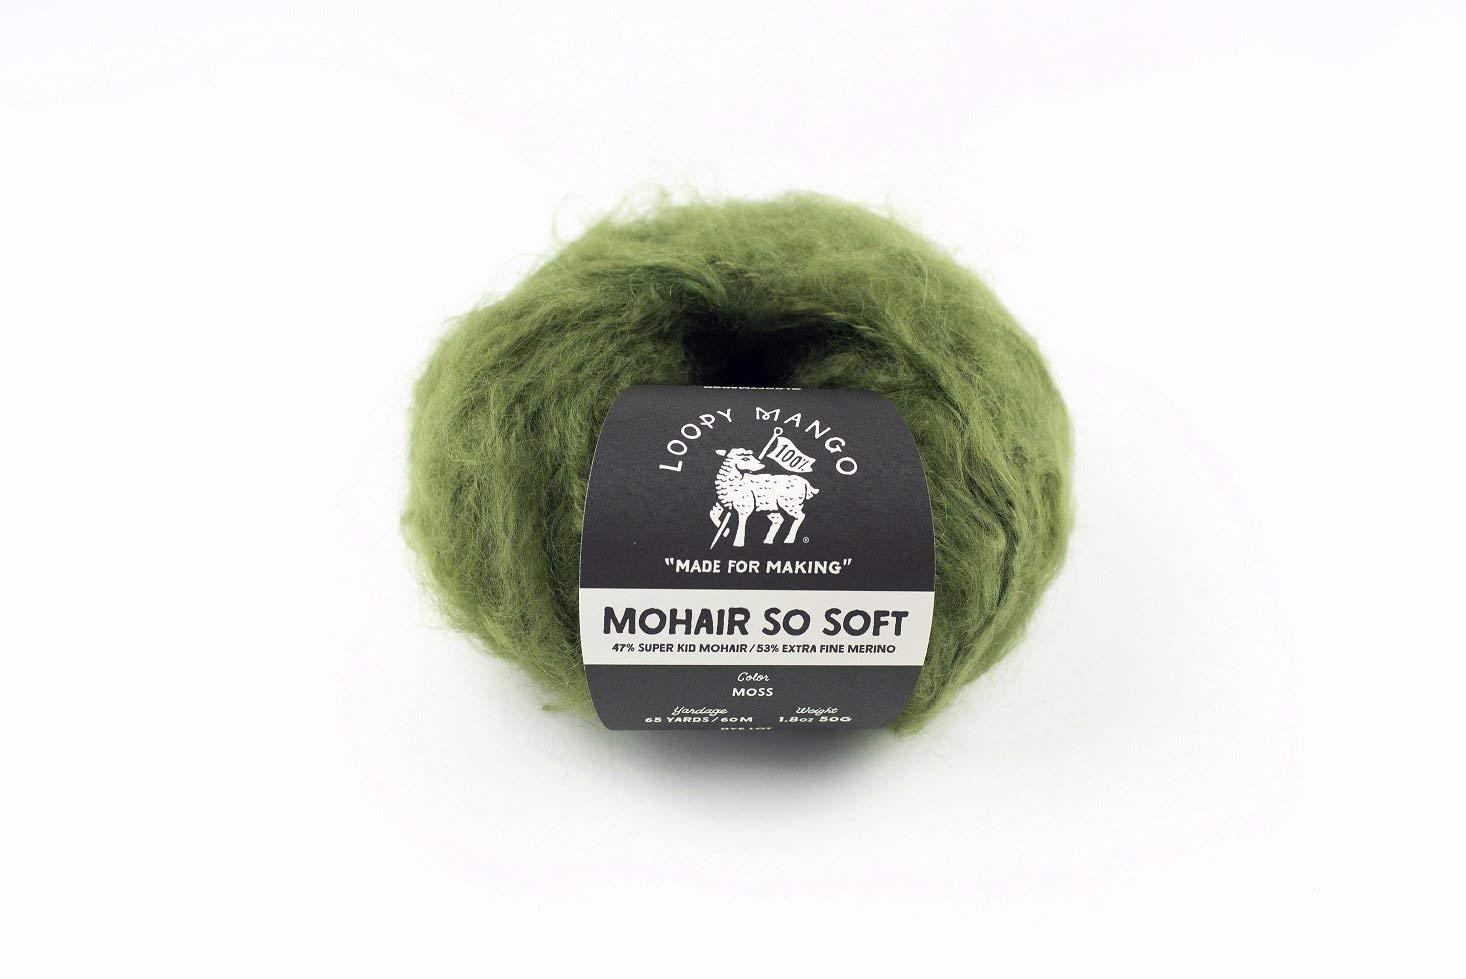 Loopy Mango DIY Knit Kit - Medium/Large Long Cardigan - Mohair So Soft (Moss) by Loopy Mango (Image #6)